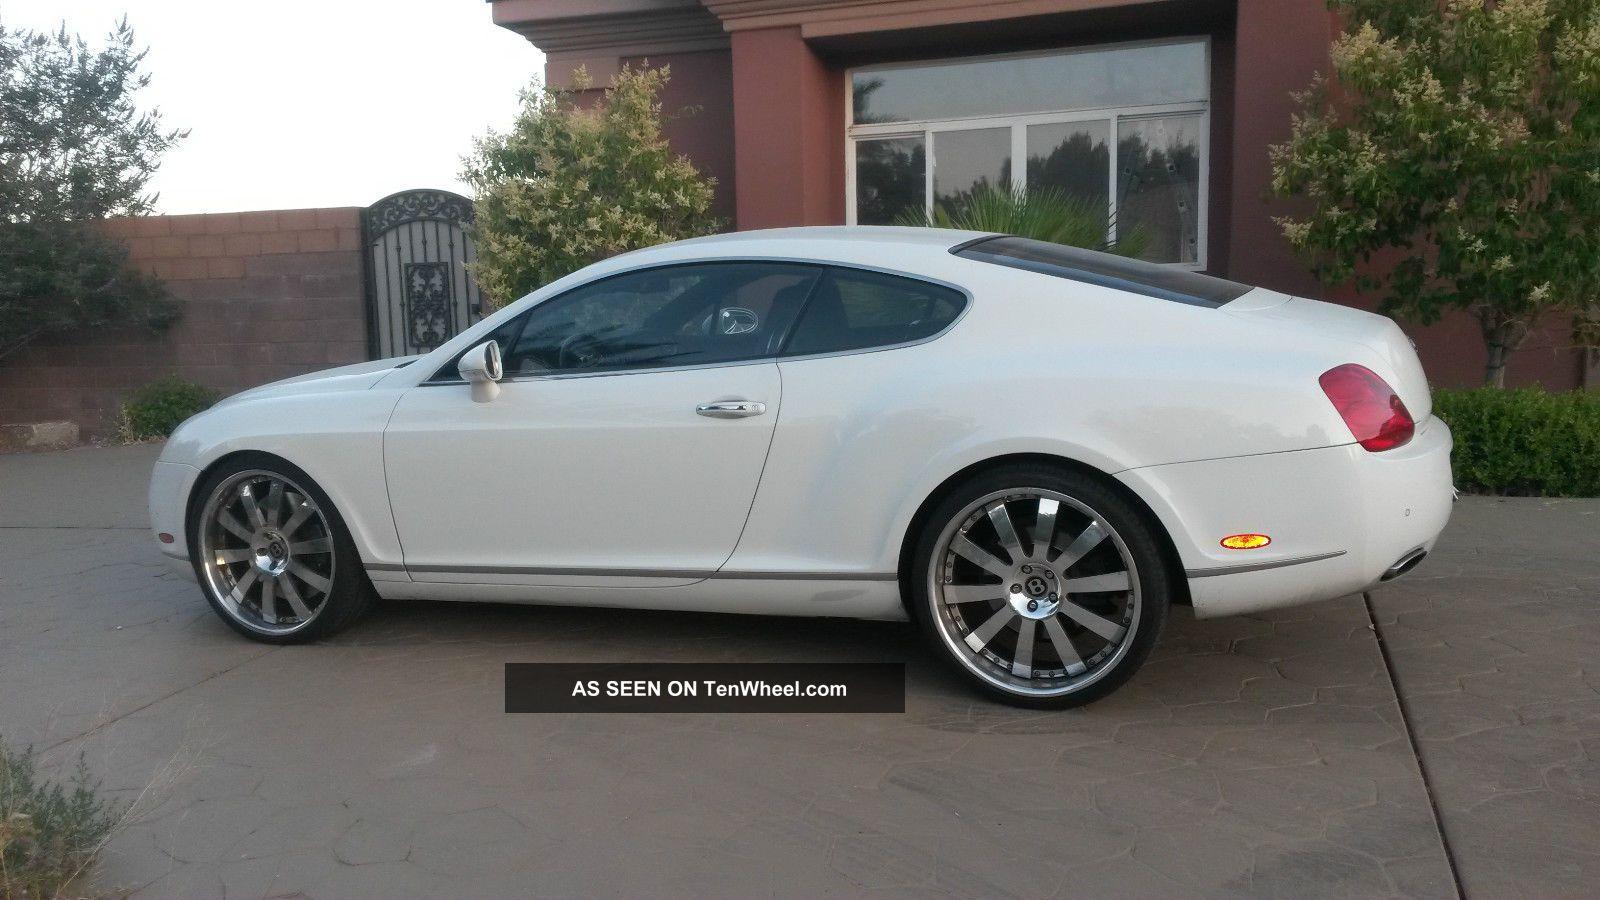 White Bentley Continental Gt Lgw